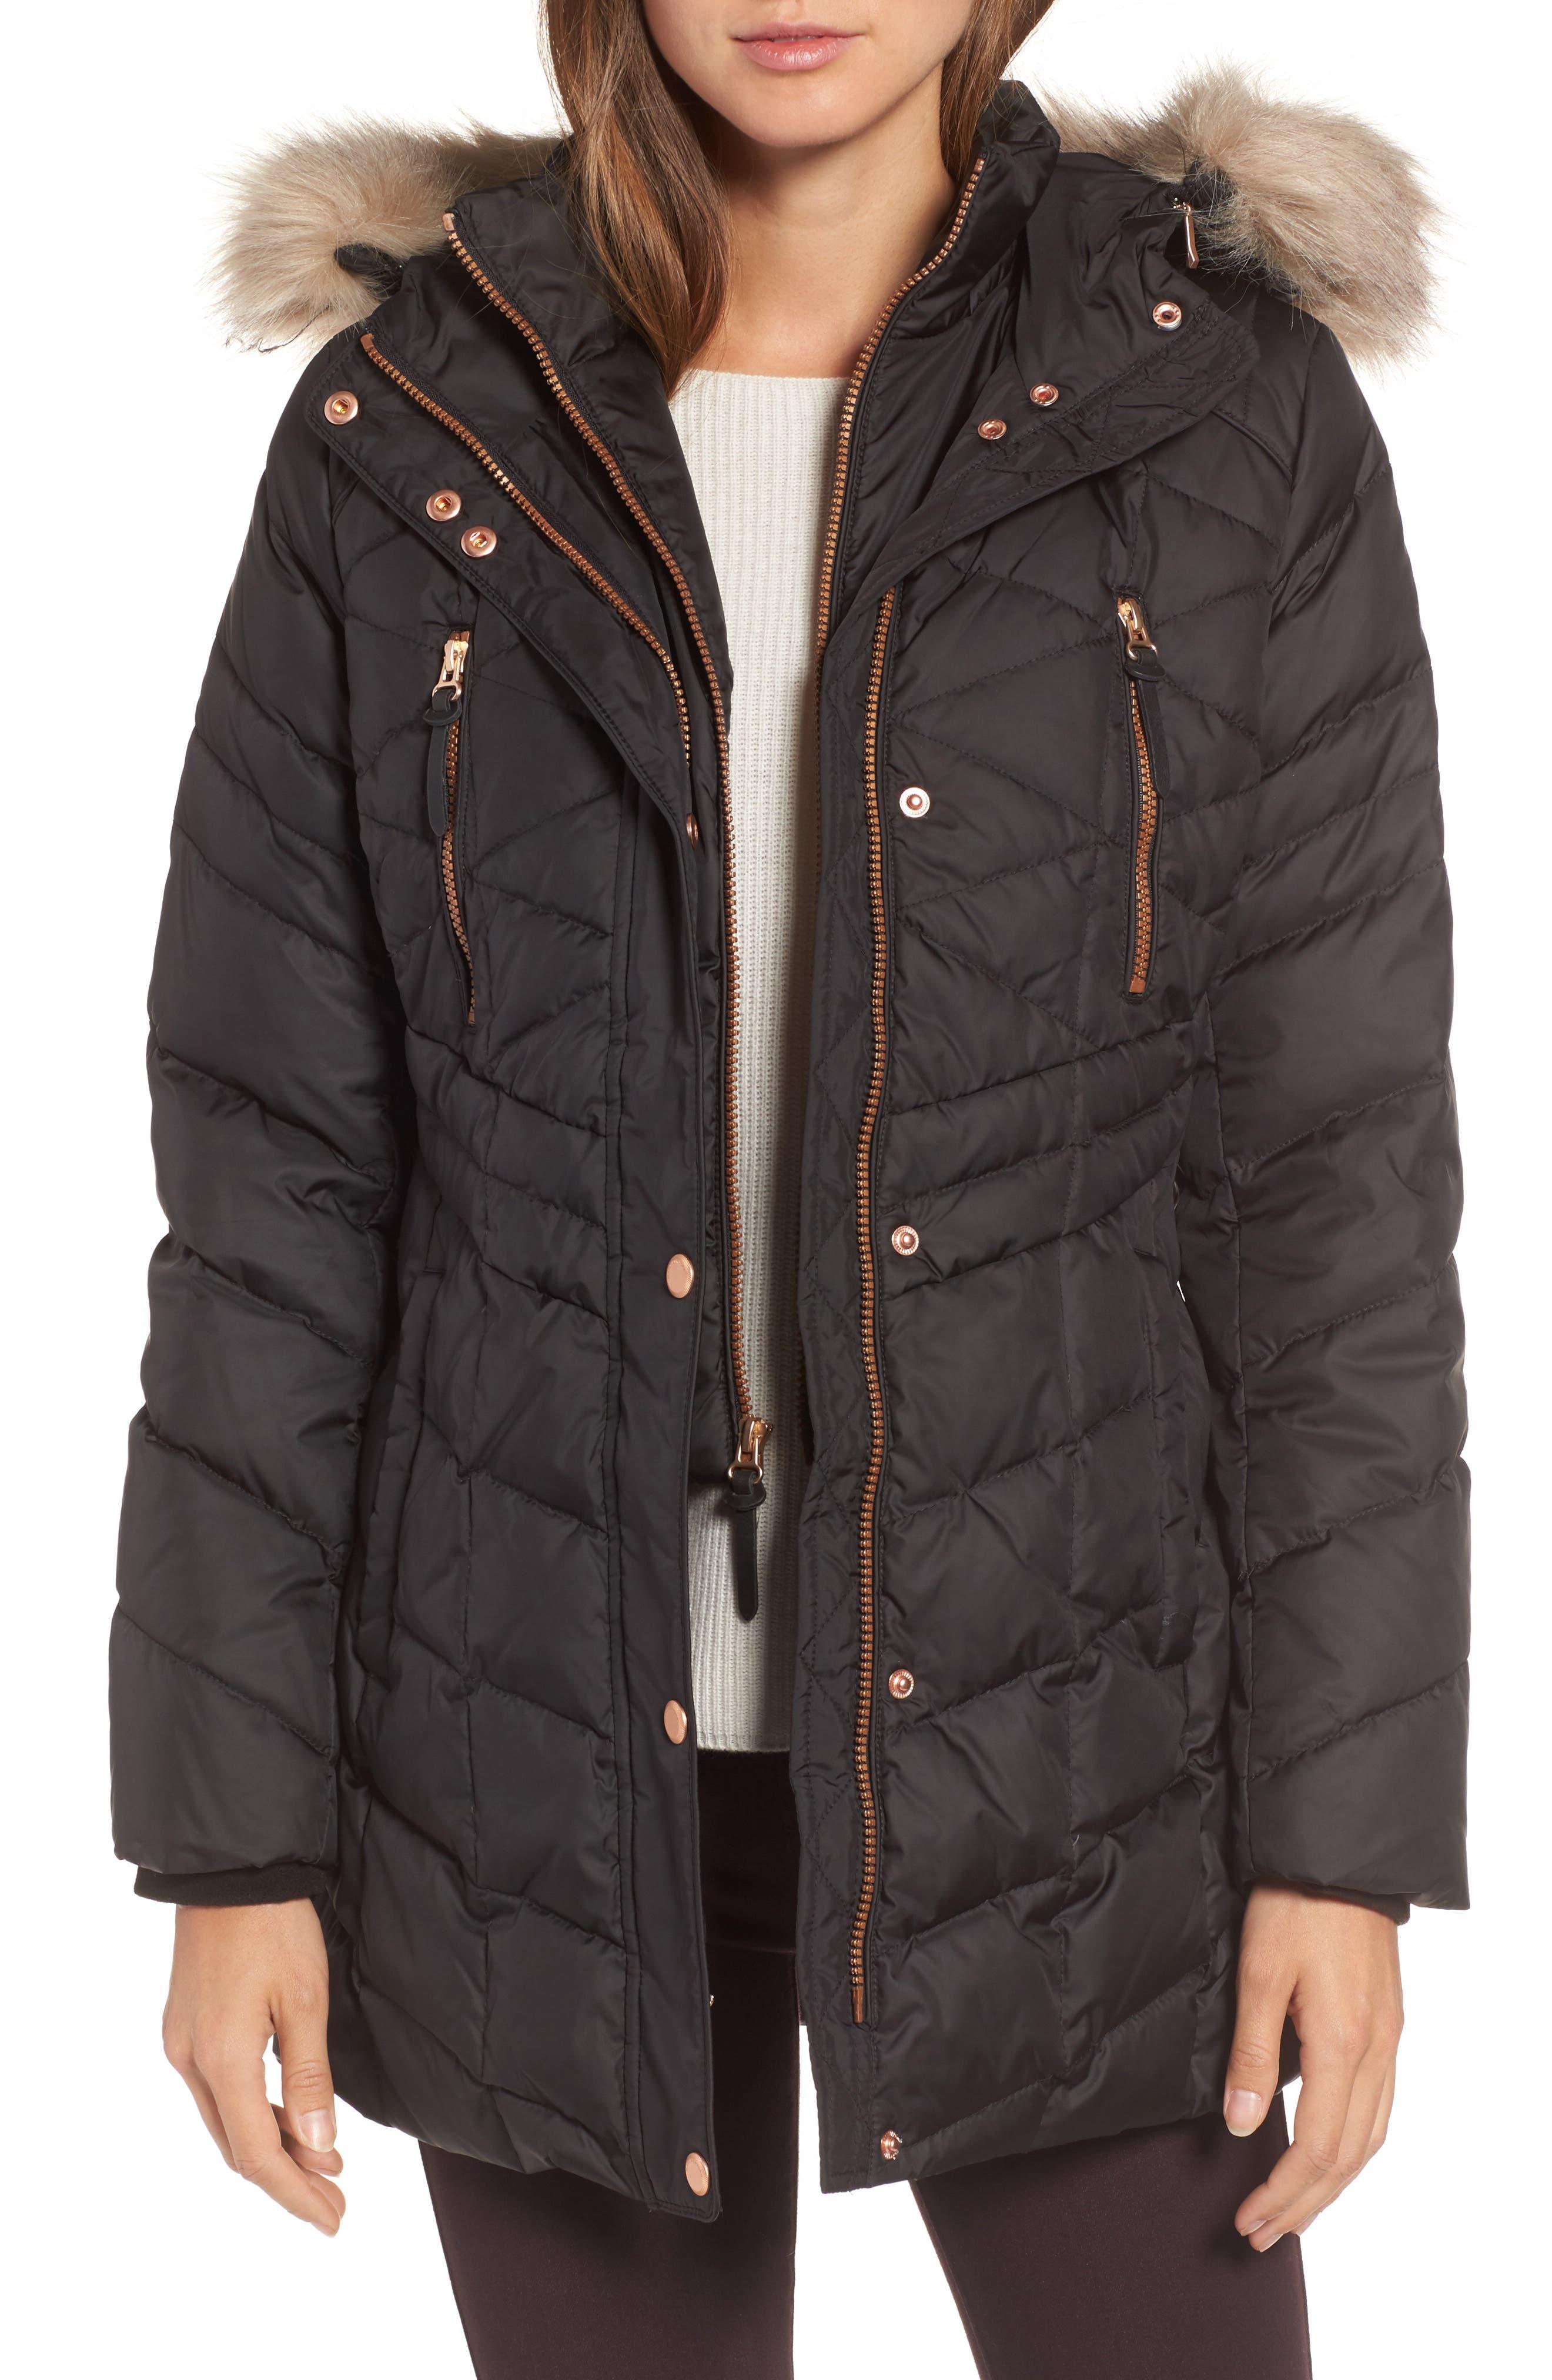 Marley 30 Coat with Detachable Faux Fur,                         Main,                         color, 001